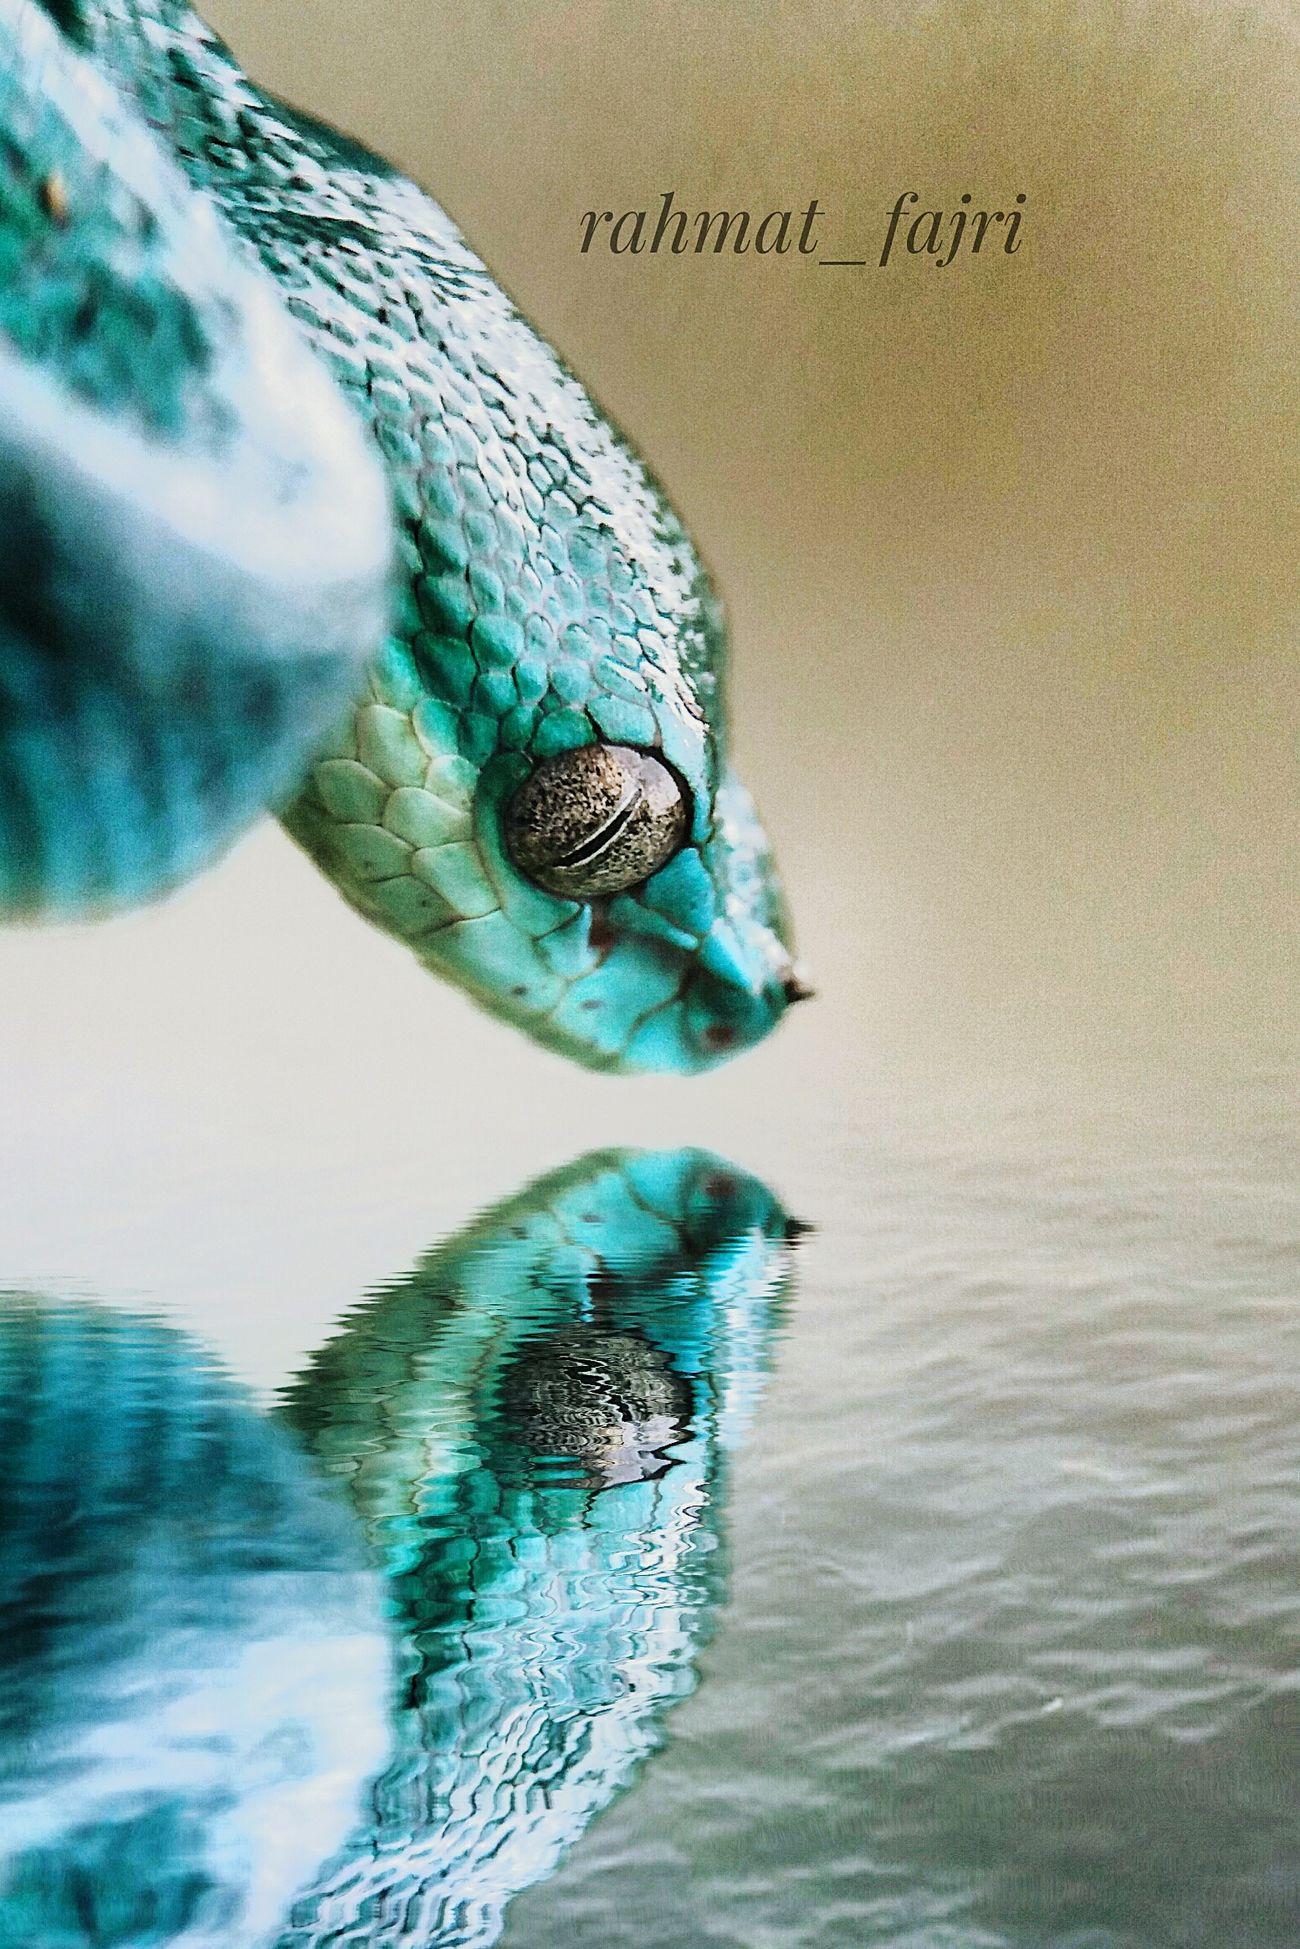 Trimesurus Cryptelytrop Insularis One Animal Animal Wildlife Animal Themes Water Venom😈 Venom Venomous Snake Venomoussnake Animal Venomousofinstagram Venomous Reptile Animals In The Wild Snake Snake Photography Snakesofinstagram Snake Eyes Snakehead Snakebites Snakes Of Eyeem Snakelover